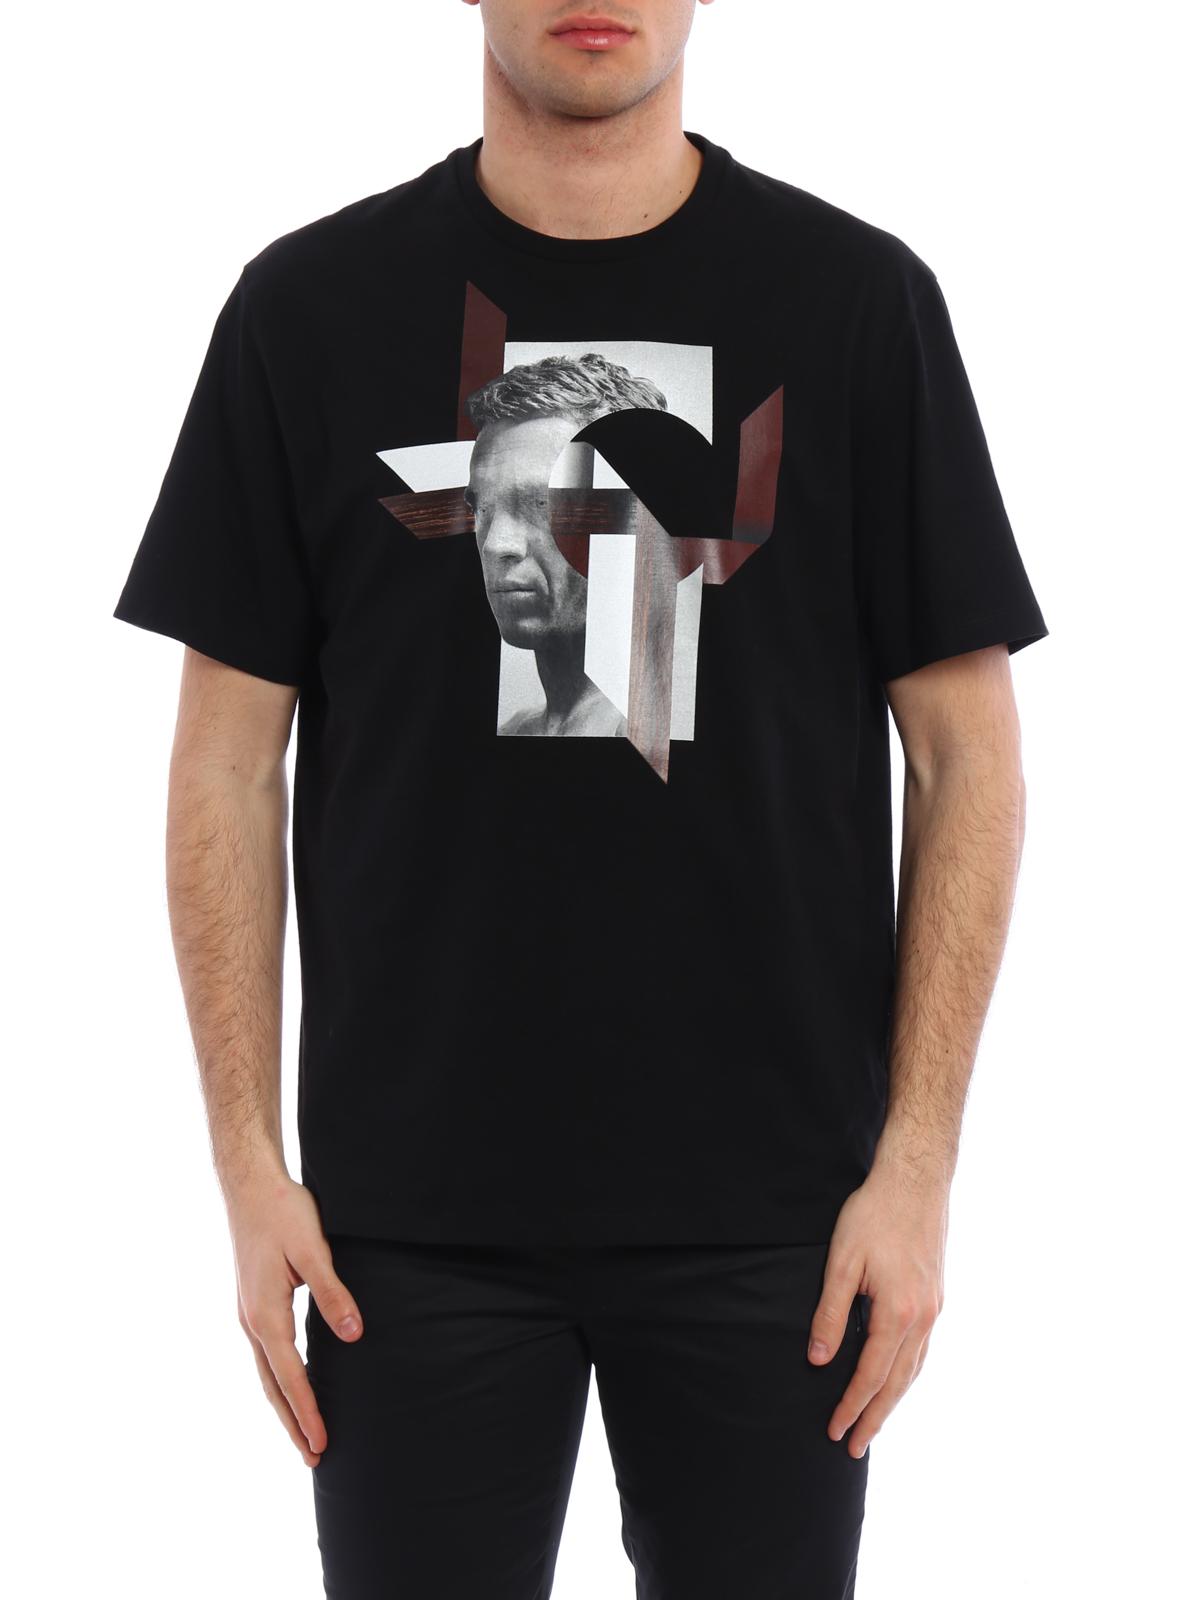 modernist steve mcqueen t shirt by neil barrett t shirts. Black Bedroom Furniture Sets. Home Design Ideas